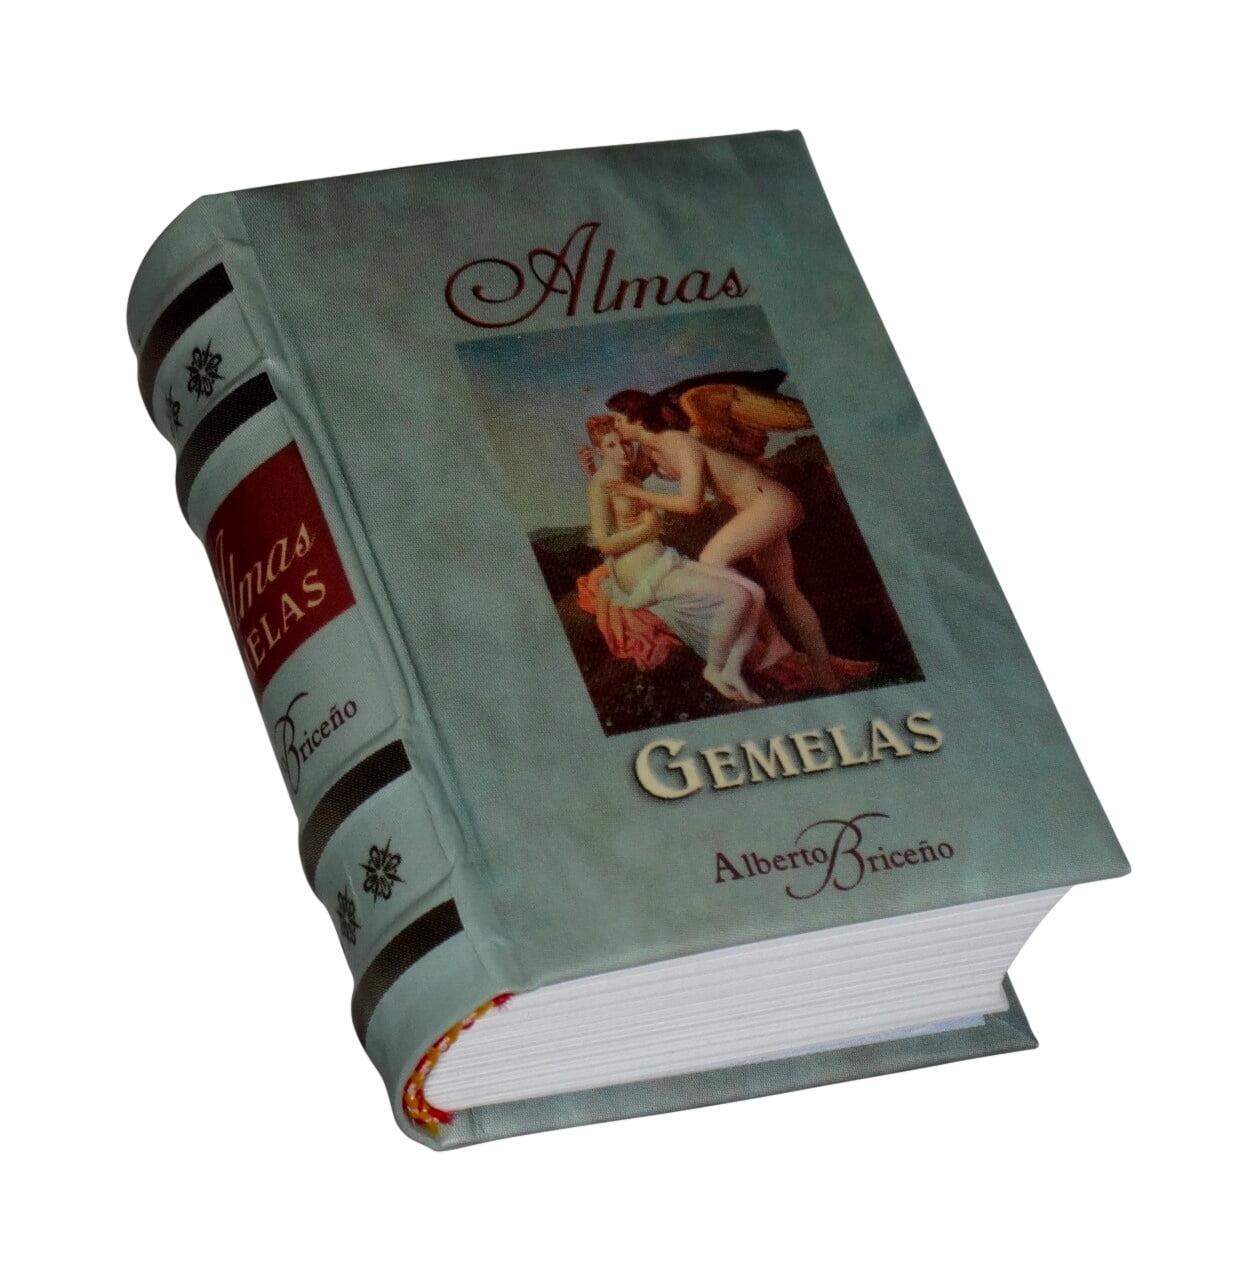 Almas_gemelas-miniature-book-libro